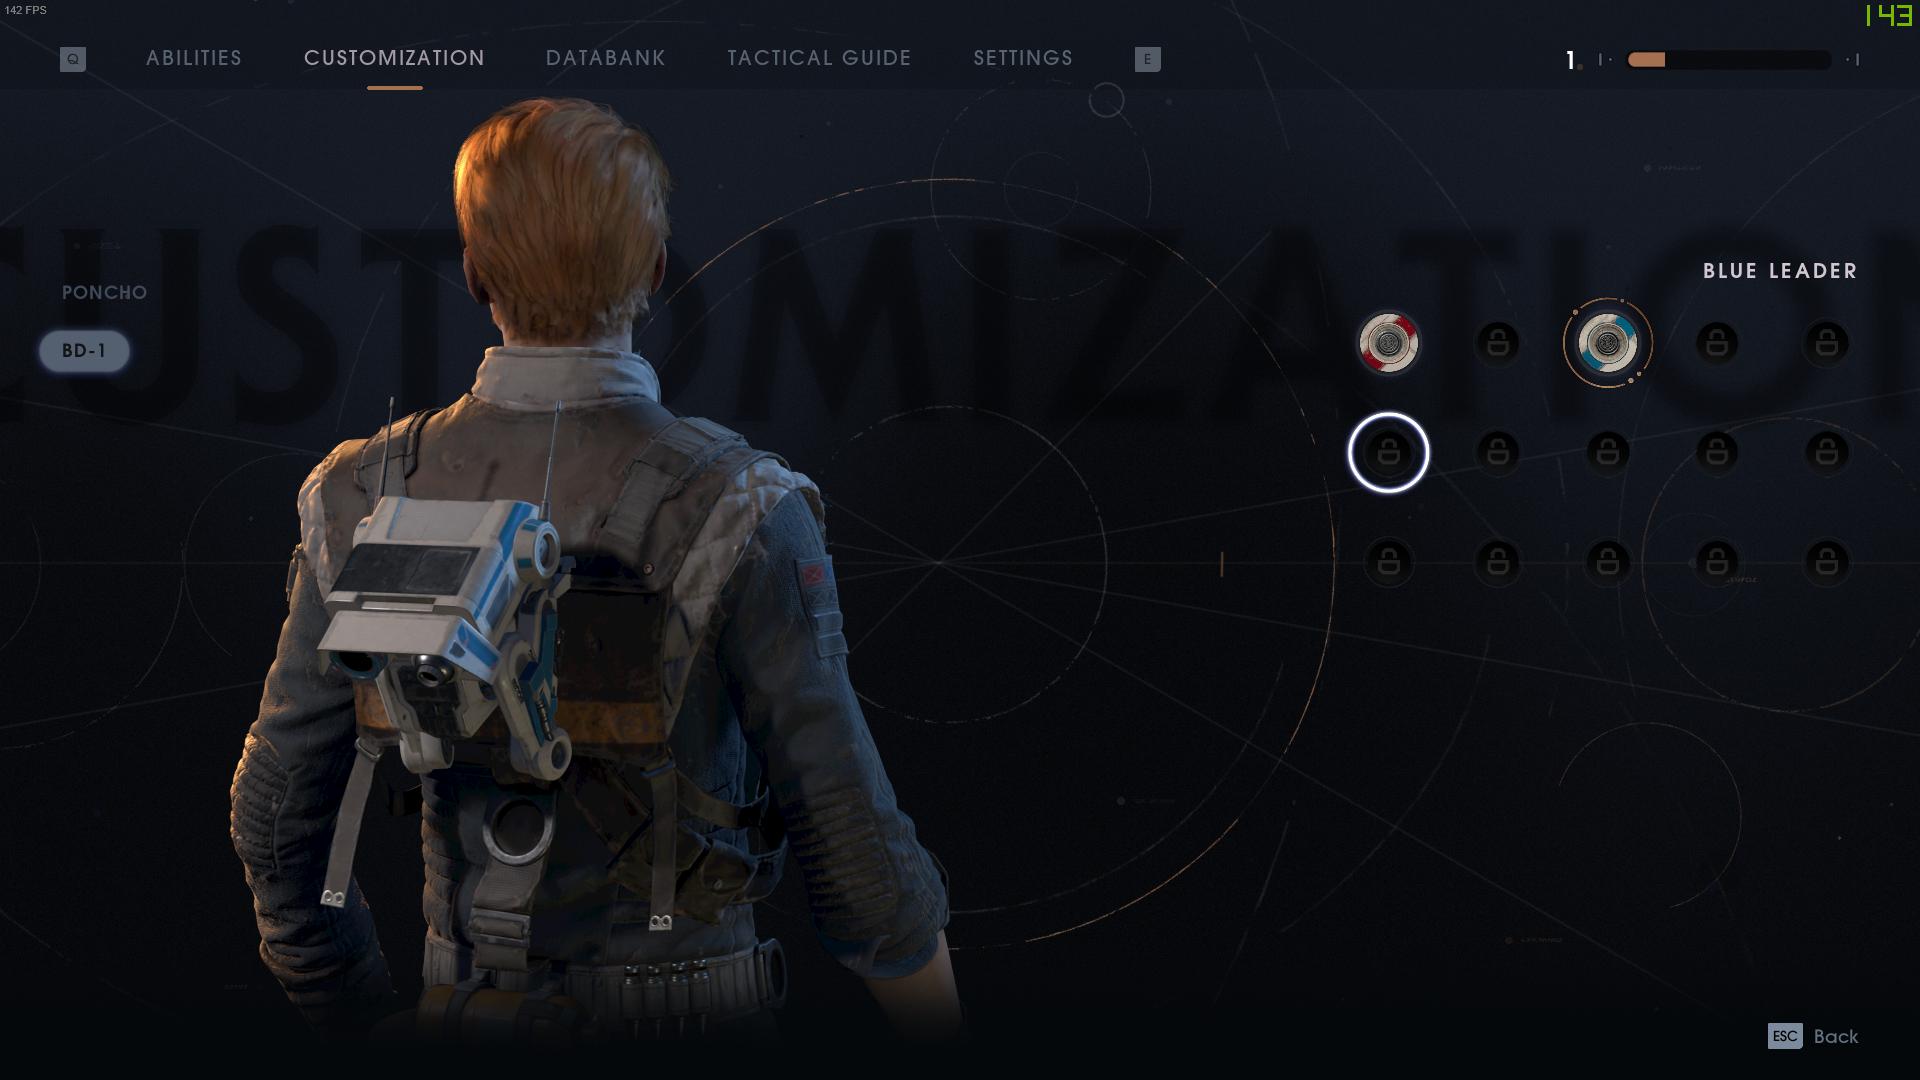 Desktop Screenshot 2019.11.15 - 12.05.21.66.png